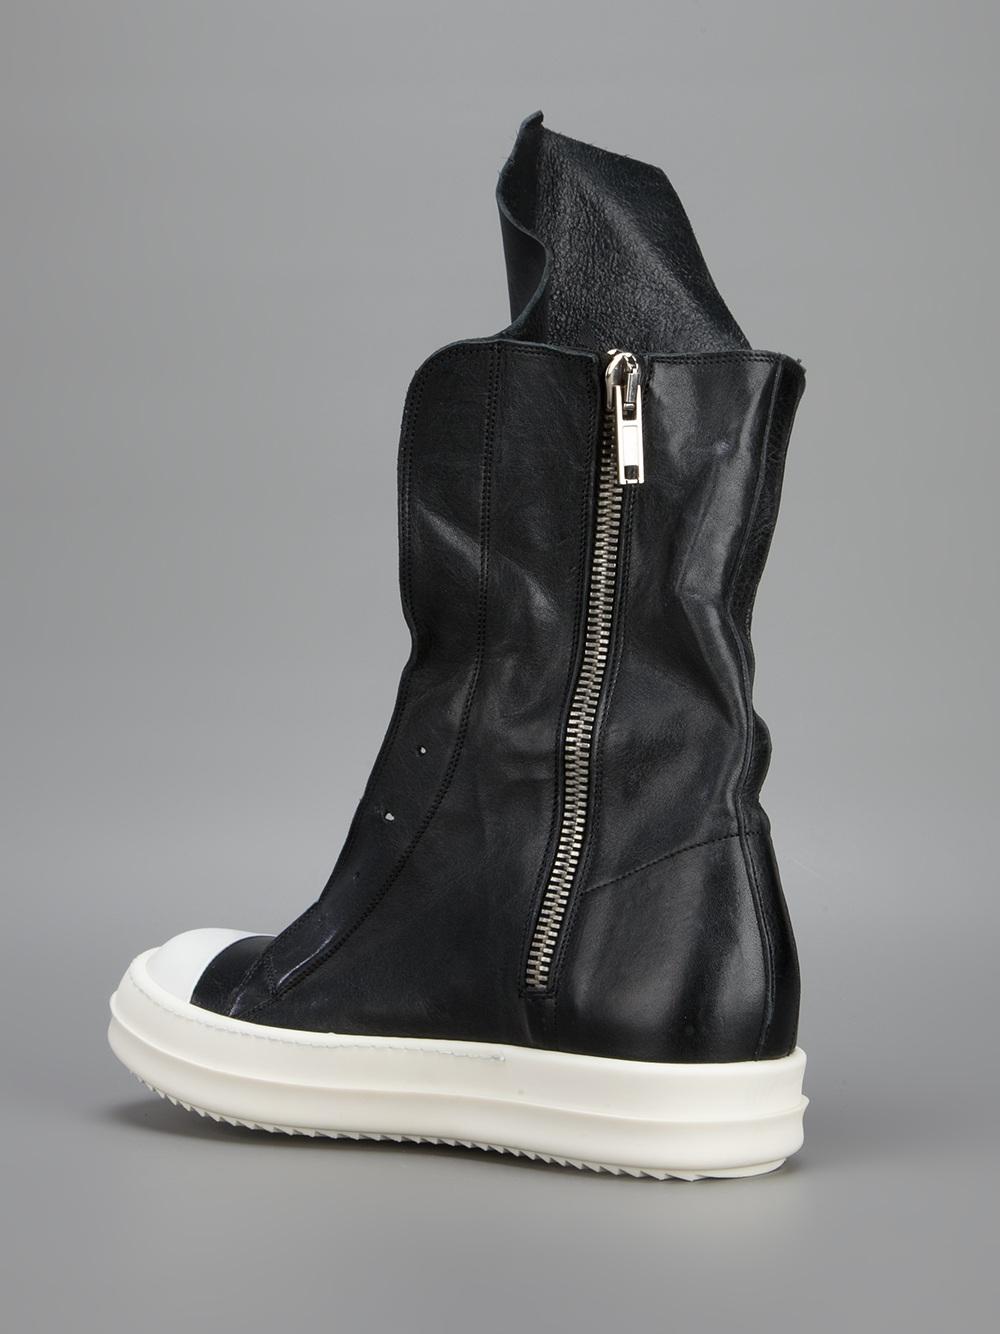 Rick Owen Ramones | Rick Owens High Top Sneaker | Drkshdw Ramones